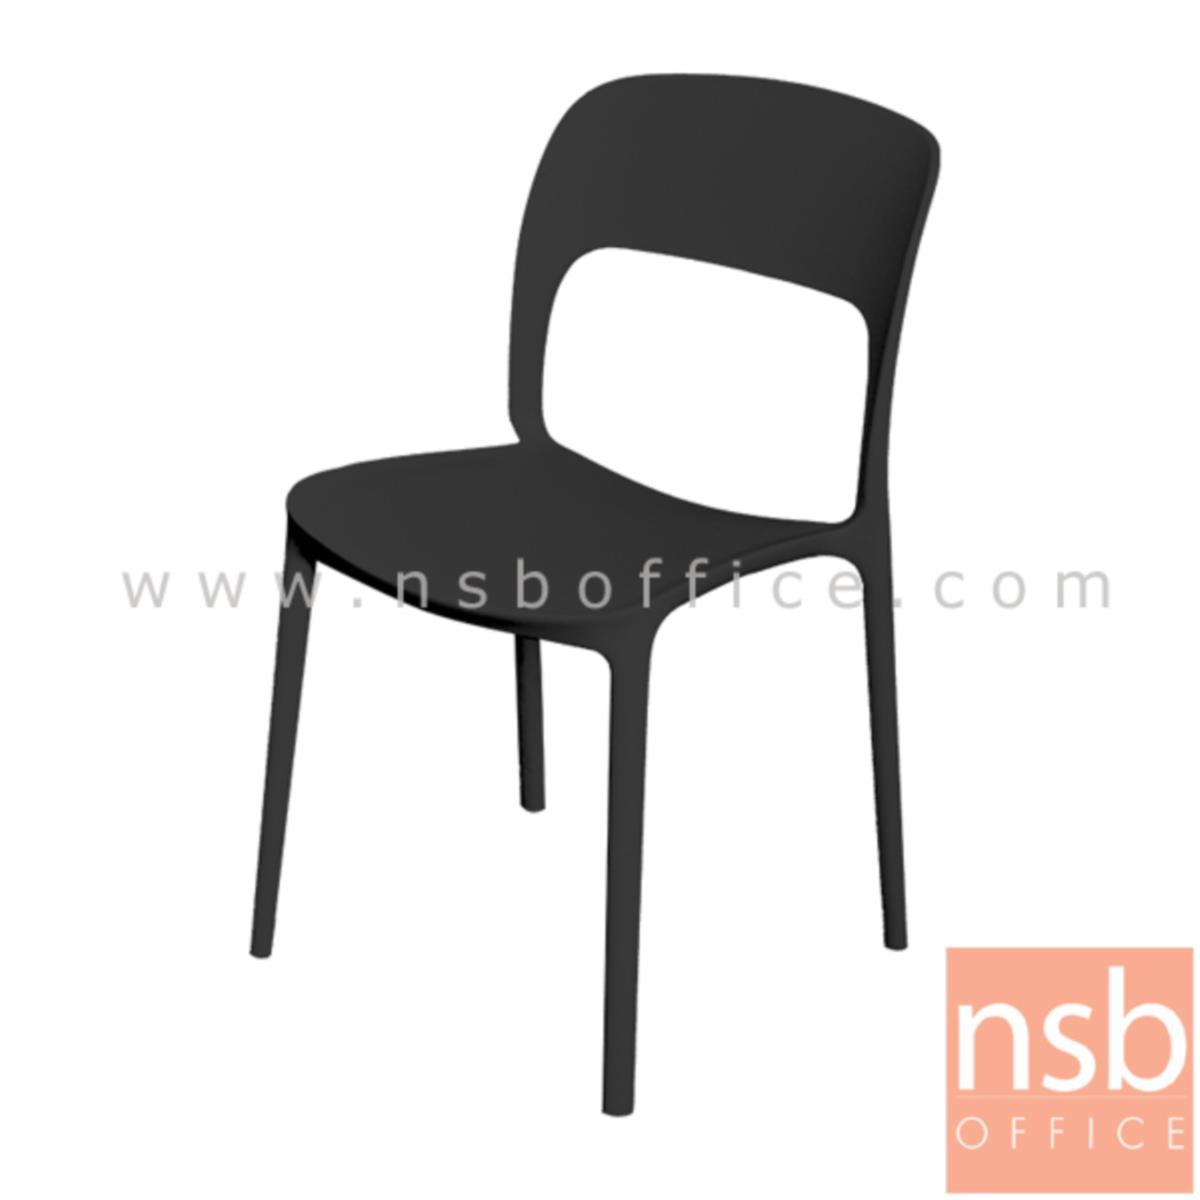 B11A032:เก้าอี้โมเดิร์นพลาสติก(PP) รุ่น NPP-7021 ขนาด 41W cm.